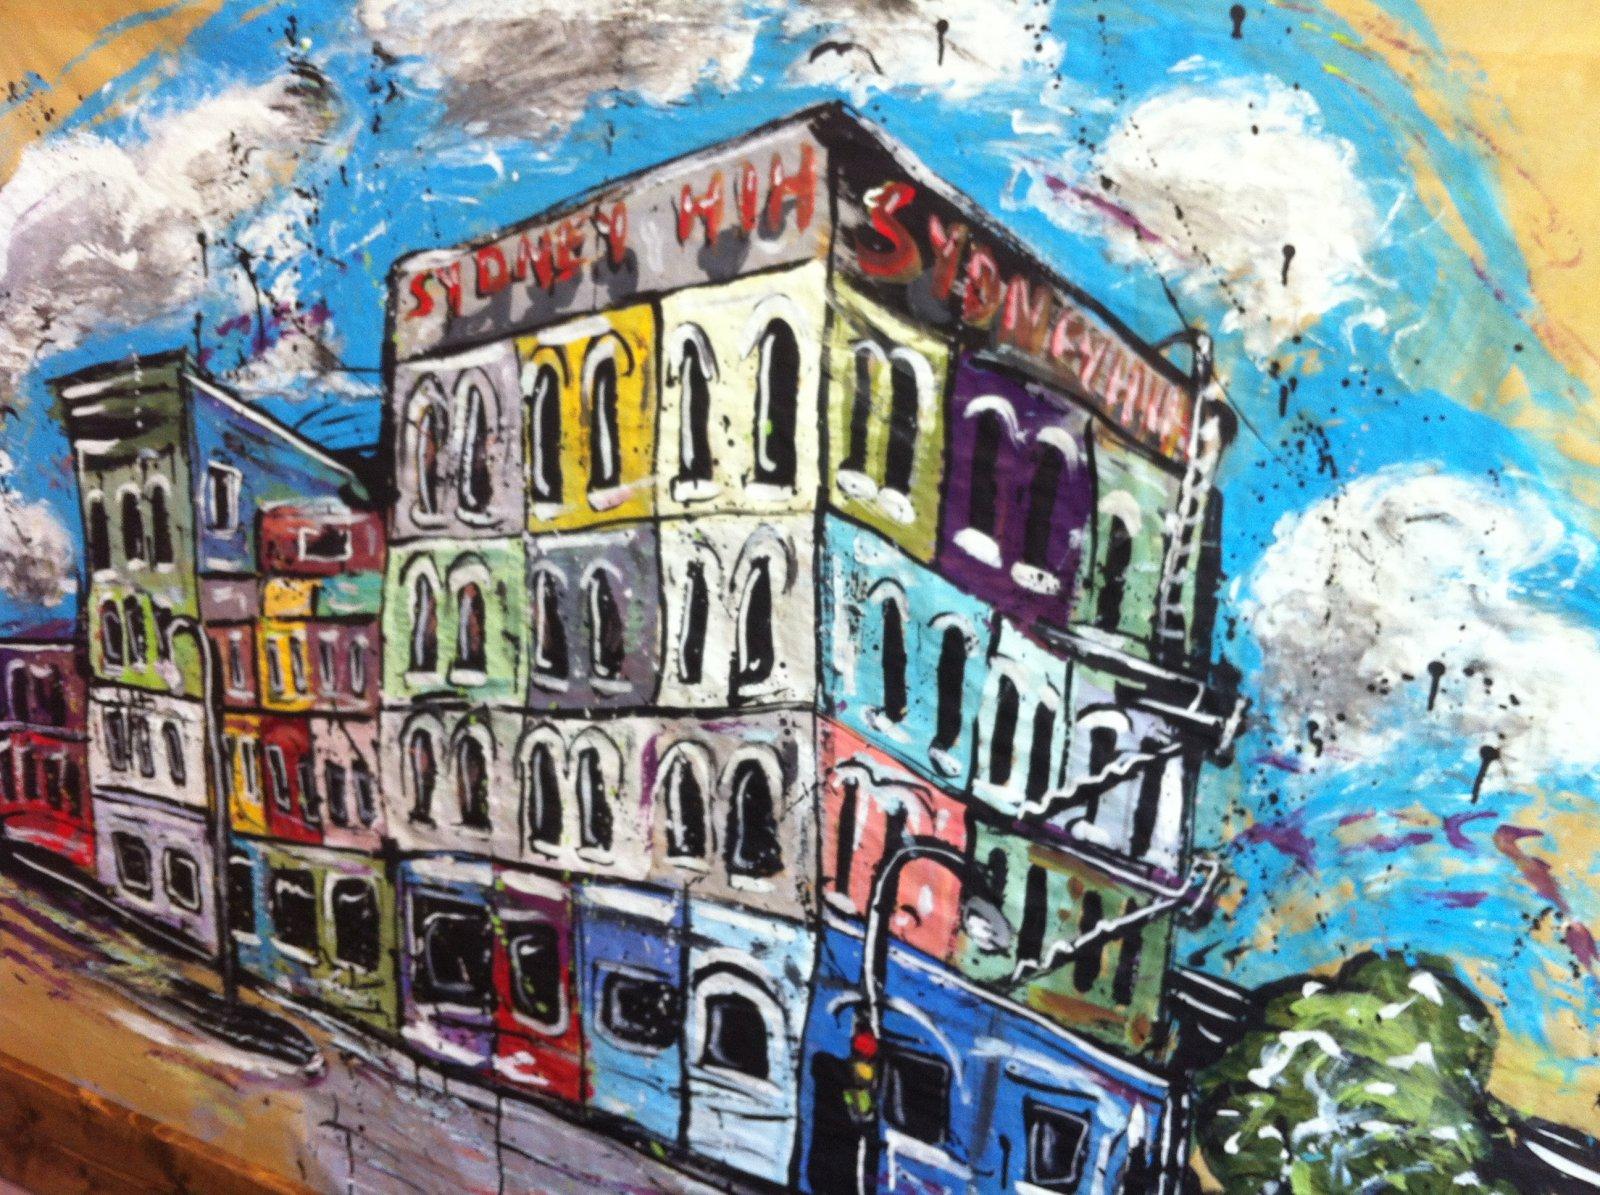 Sydney Hih Painting